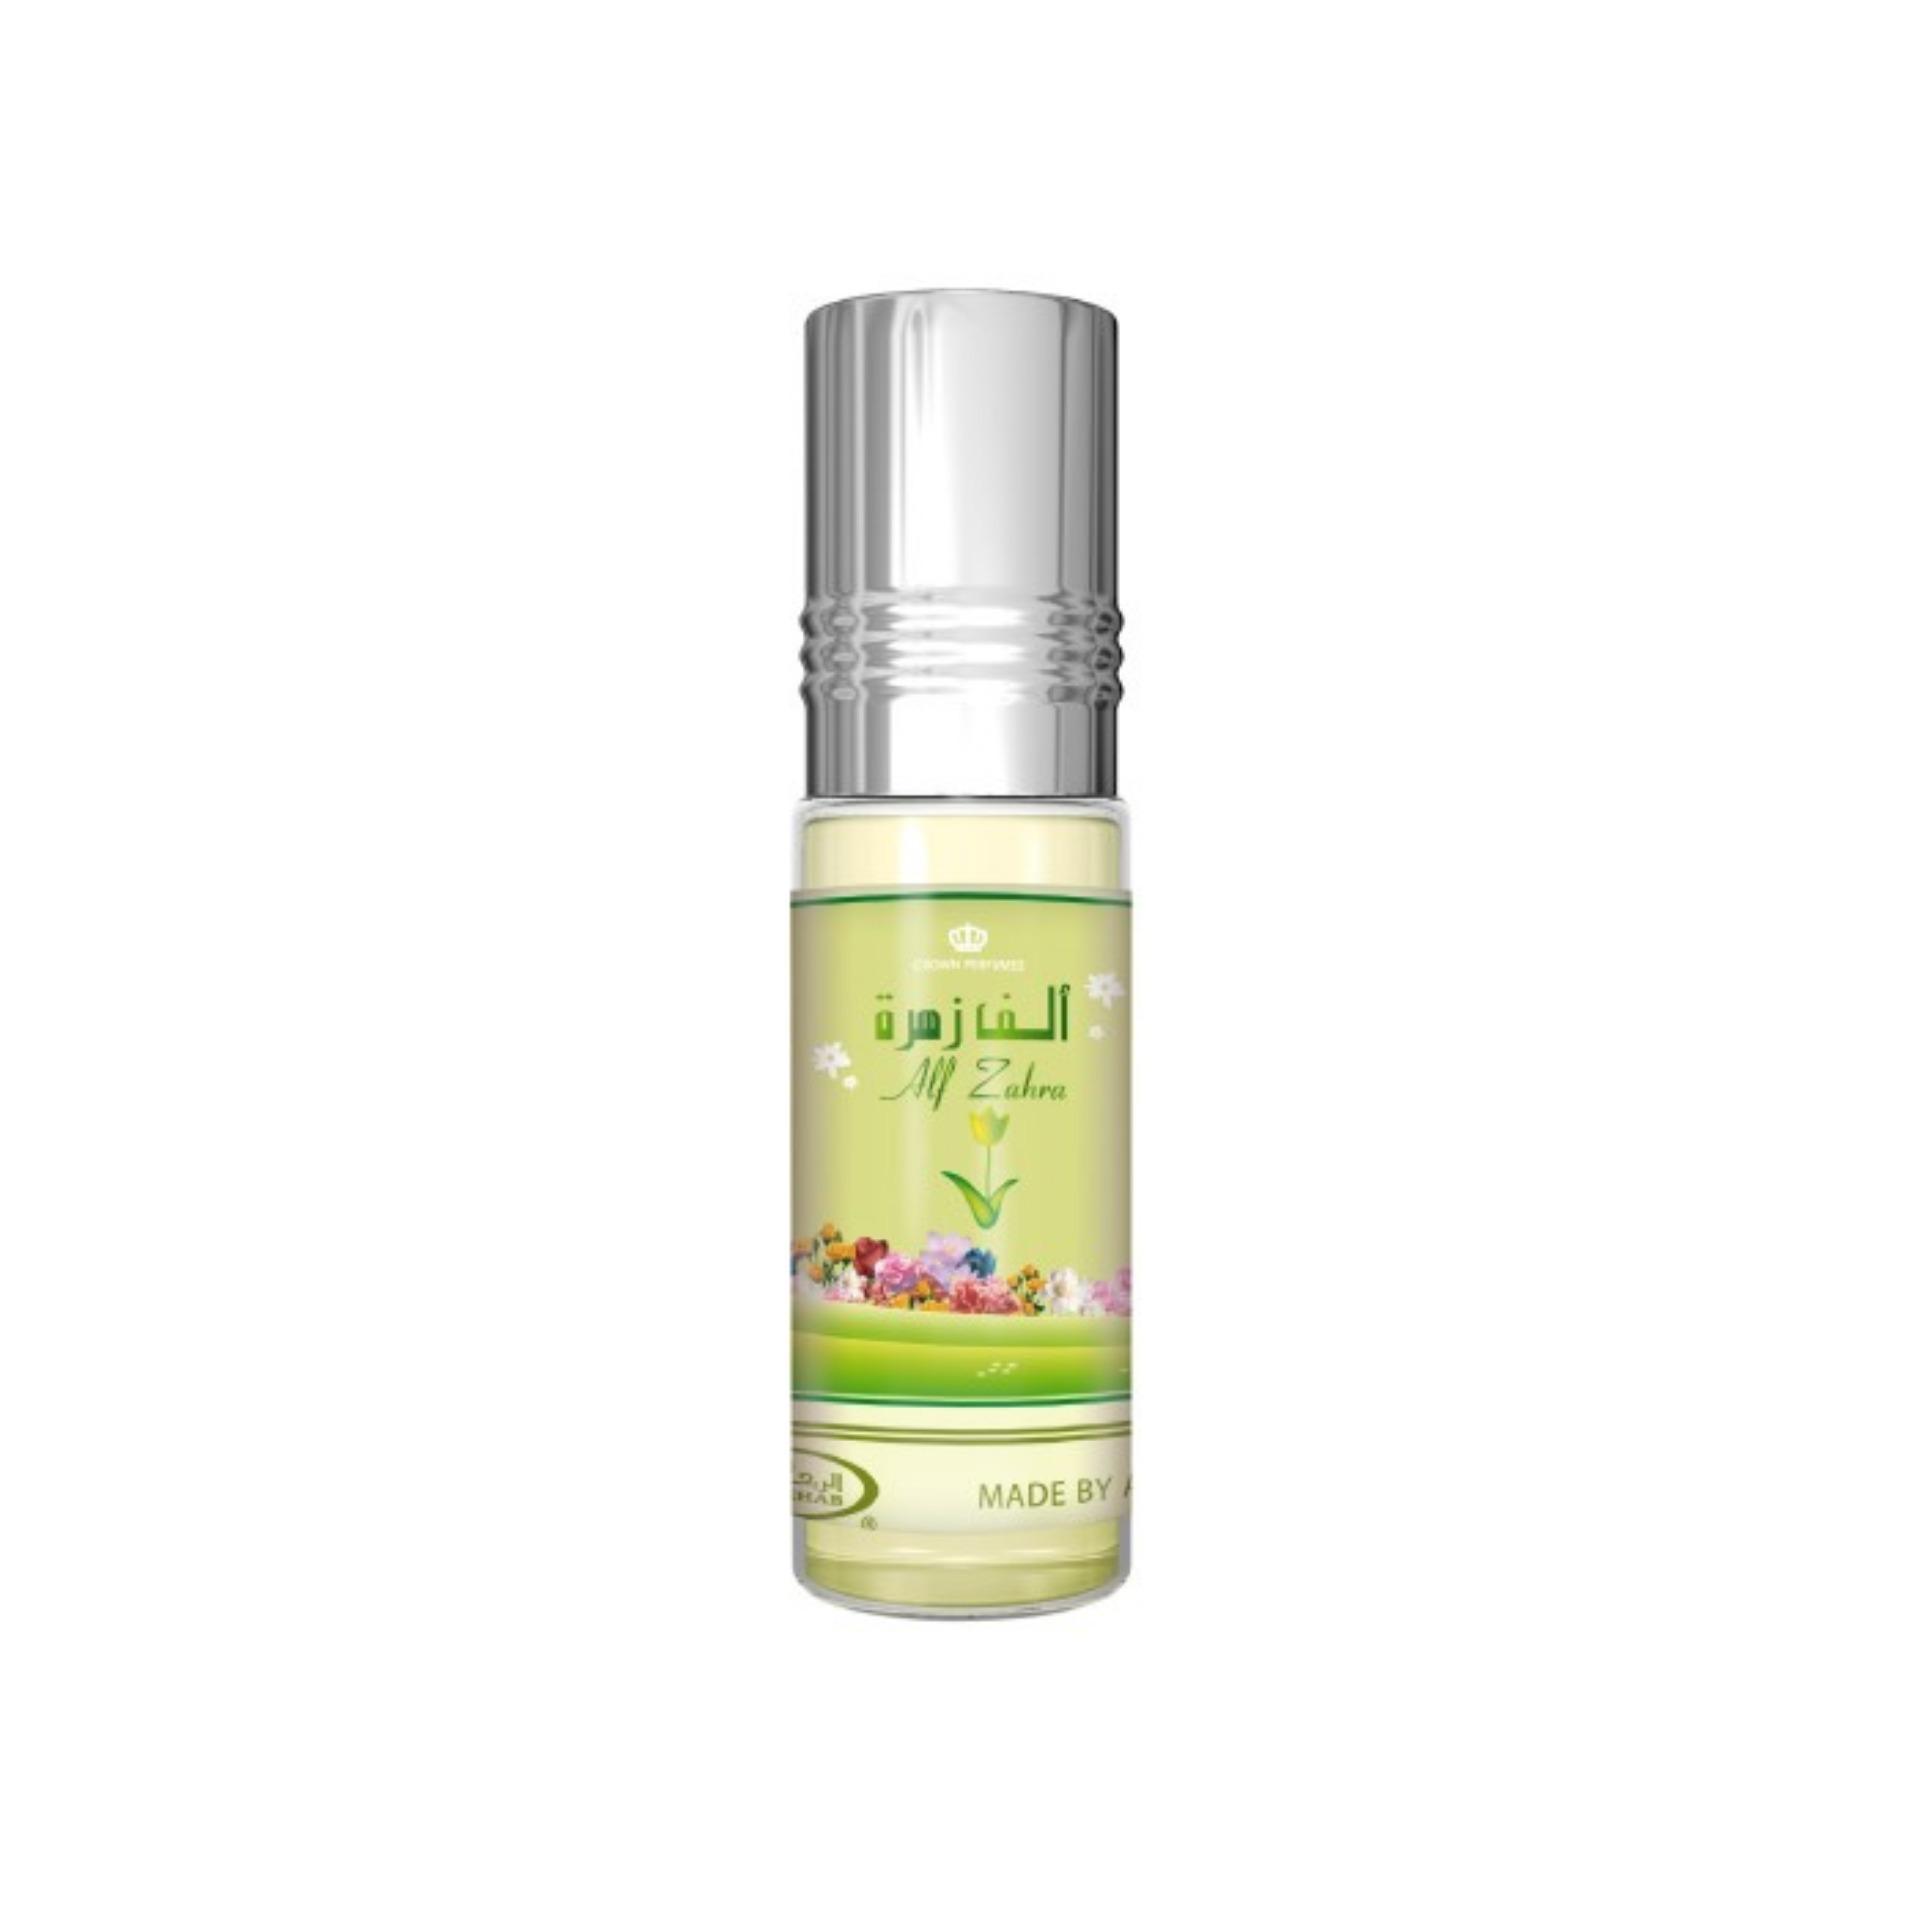 Yukay Herbal Al Rehab Perfume Alf Zahra Minyak Wangi 6 ml Non Alkohol